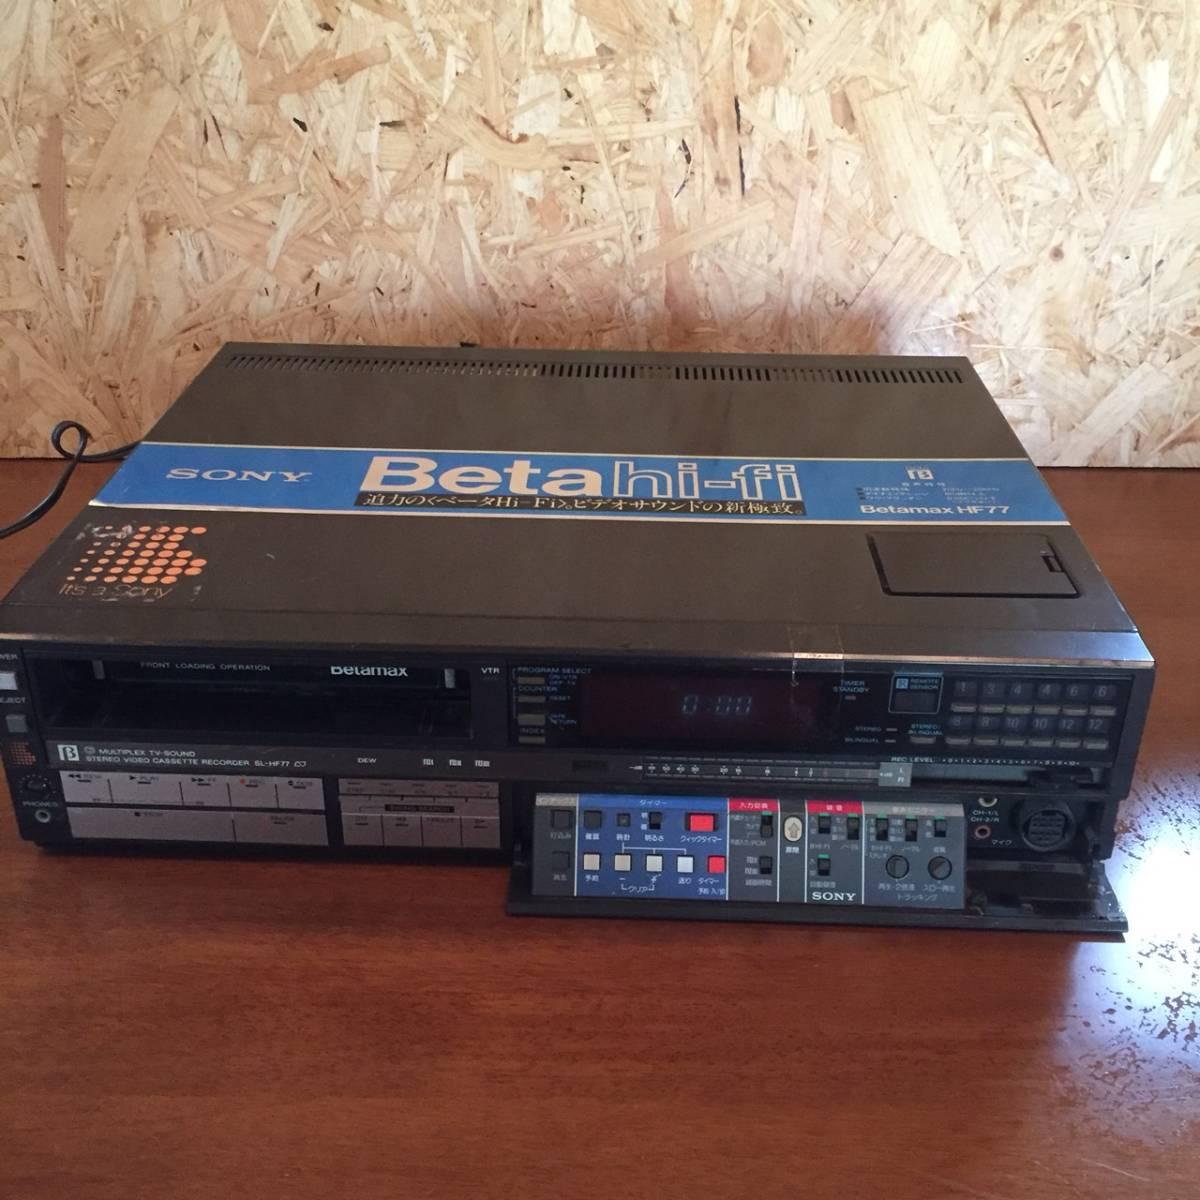 O1-567-0818 SONY Beta ベータビデオデッキ Hi-Fi SL-HF77 通電確認のみなので、ジャンク出品_画像1